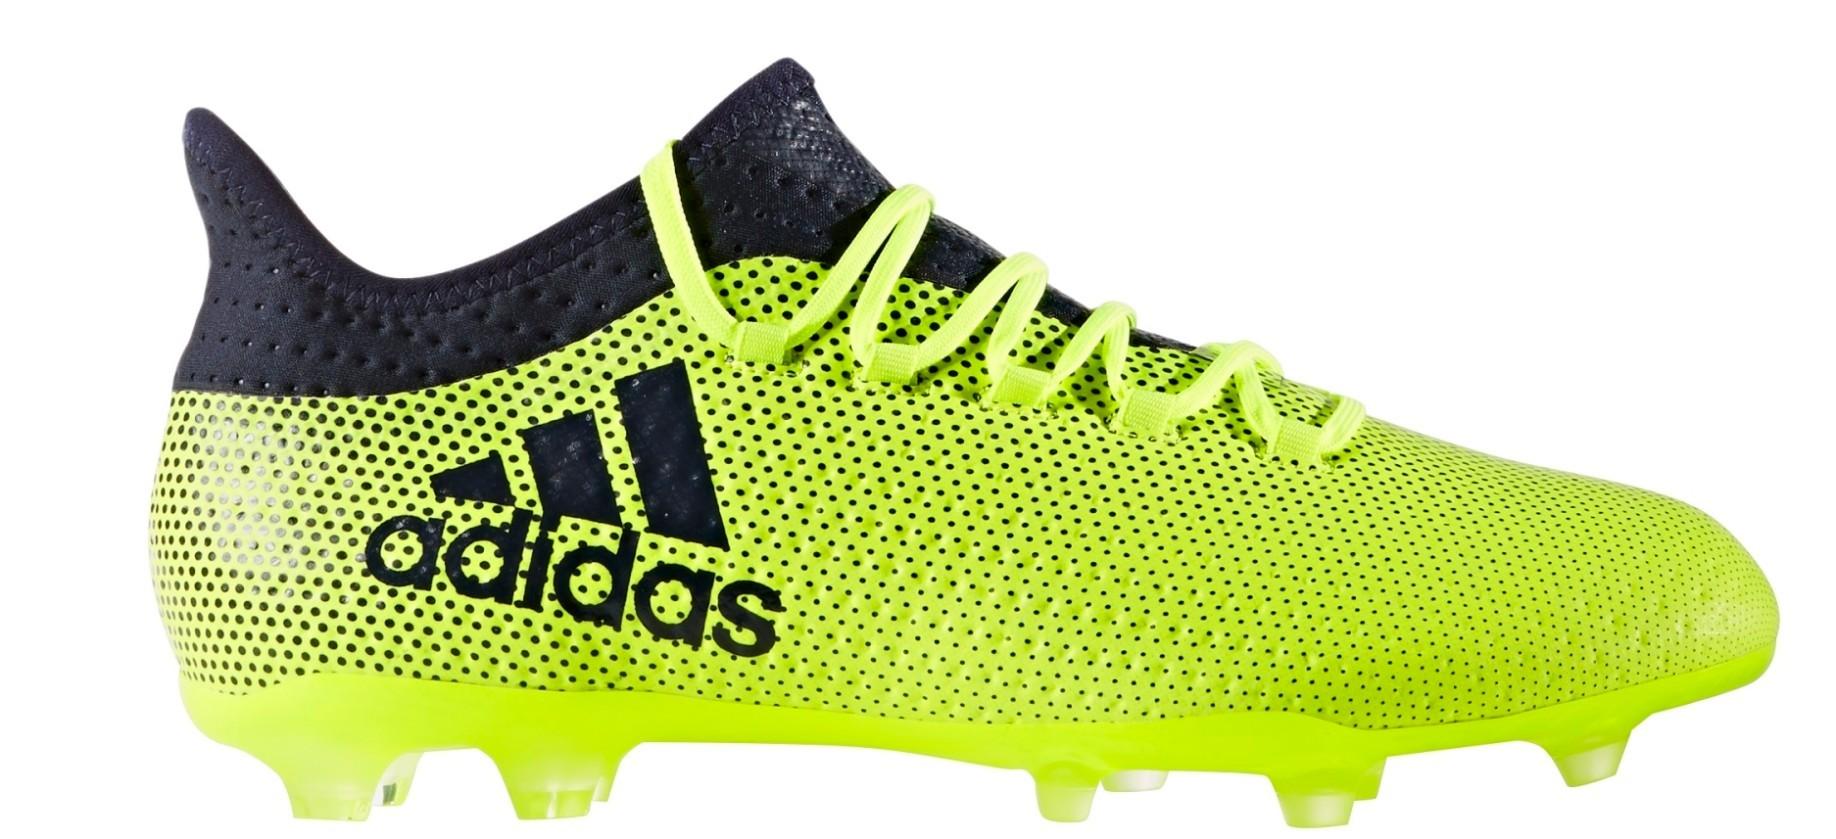 save off 751f9 a1a84 Football boots Adidas X 17.2 FG Ocean Storm Pack